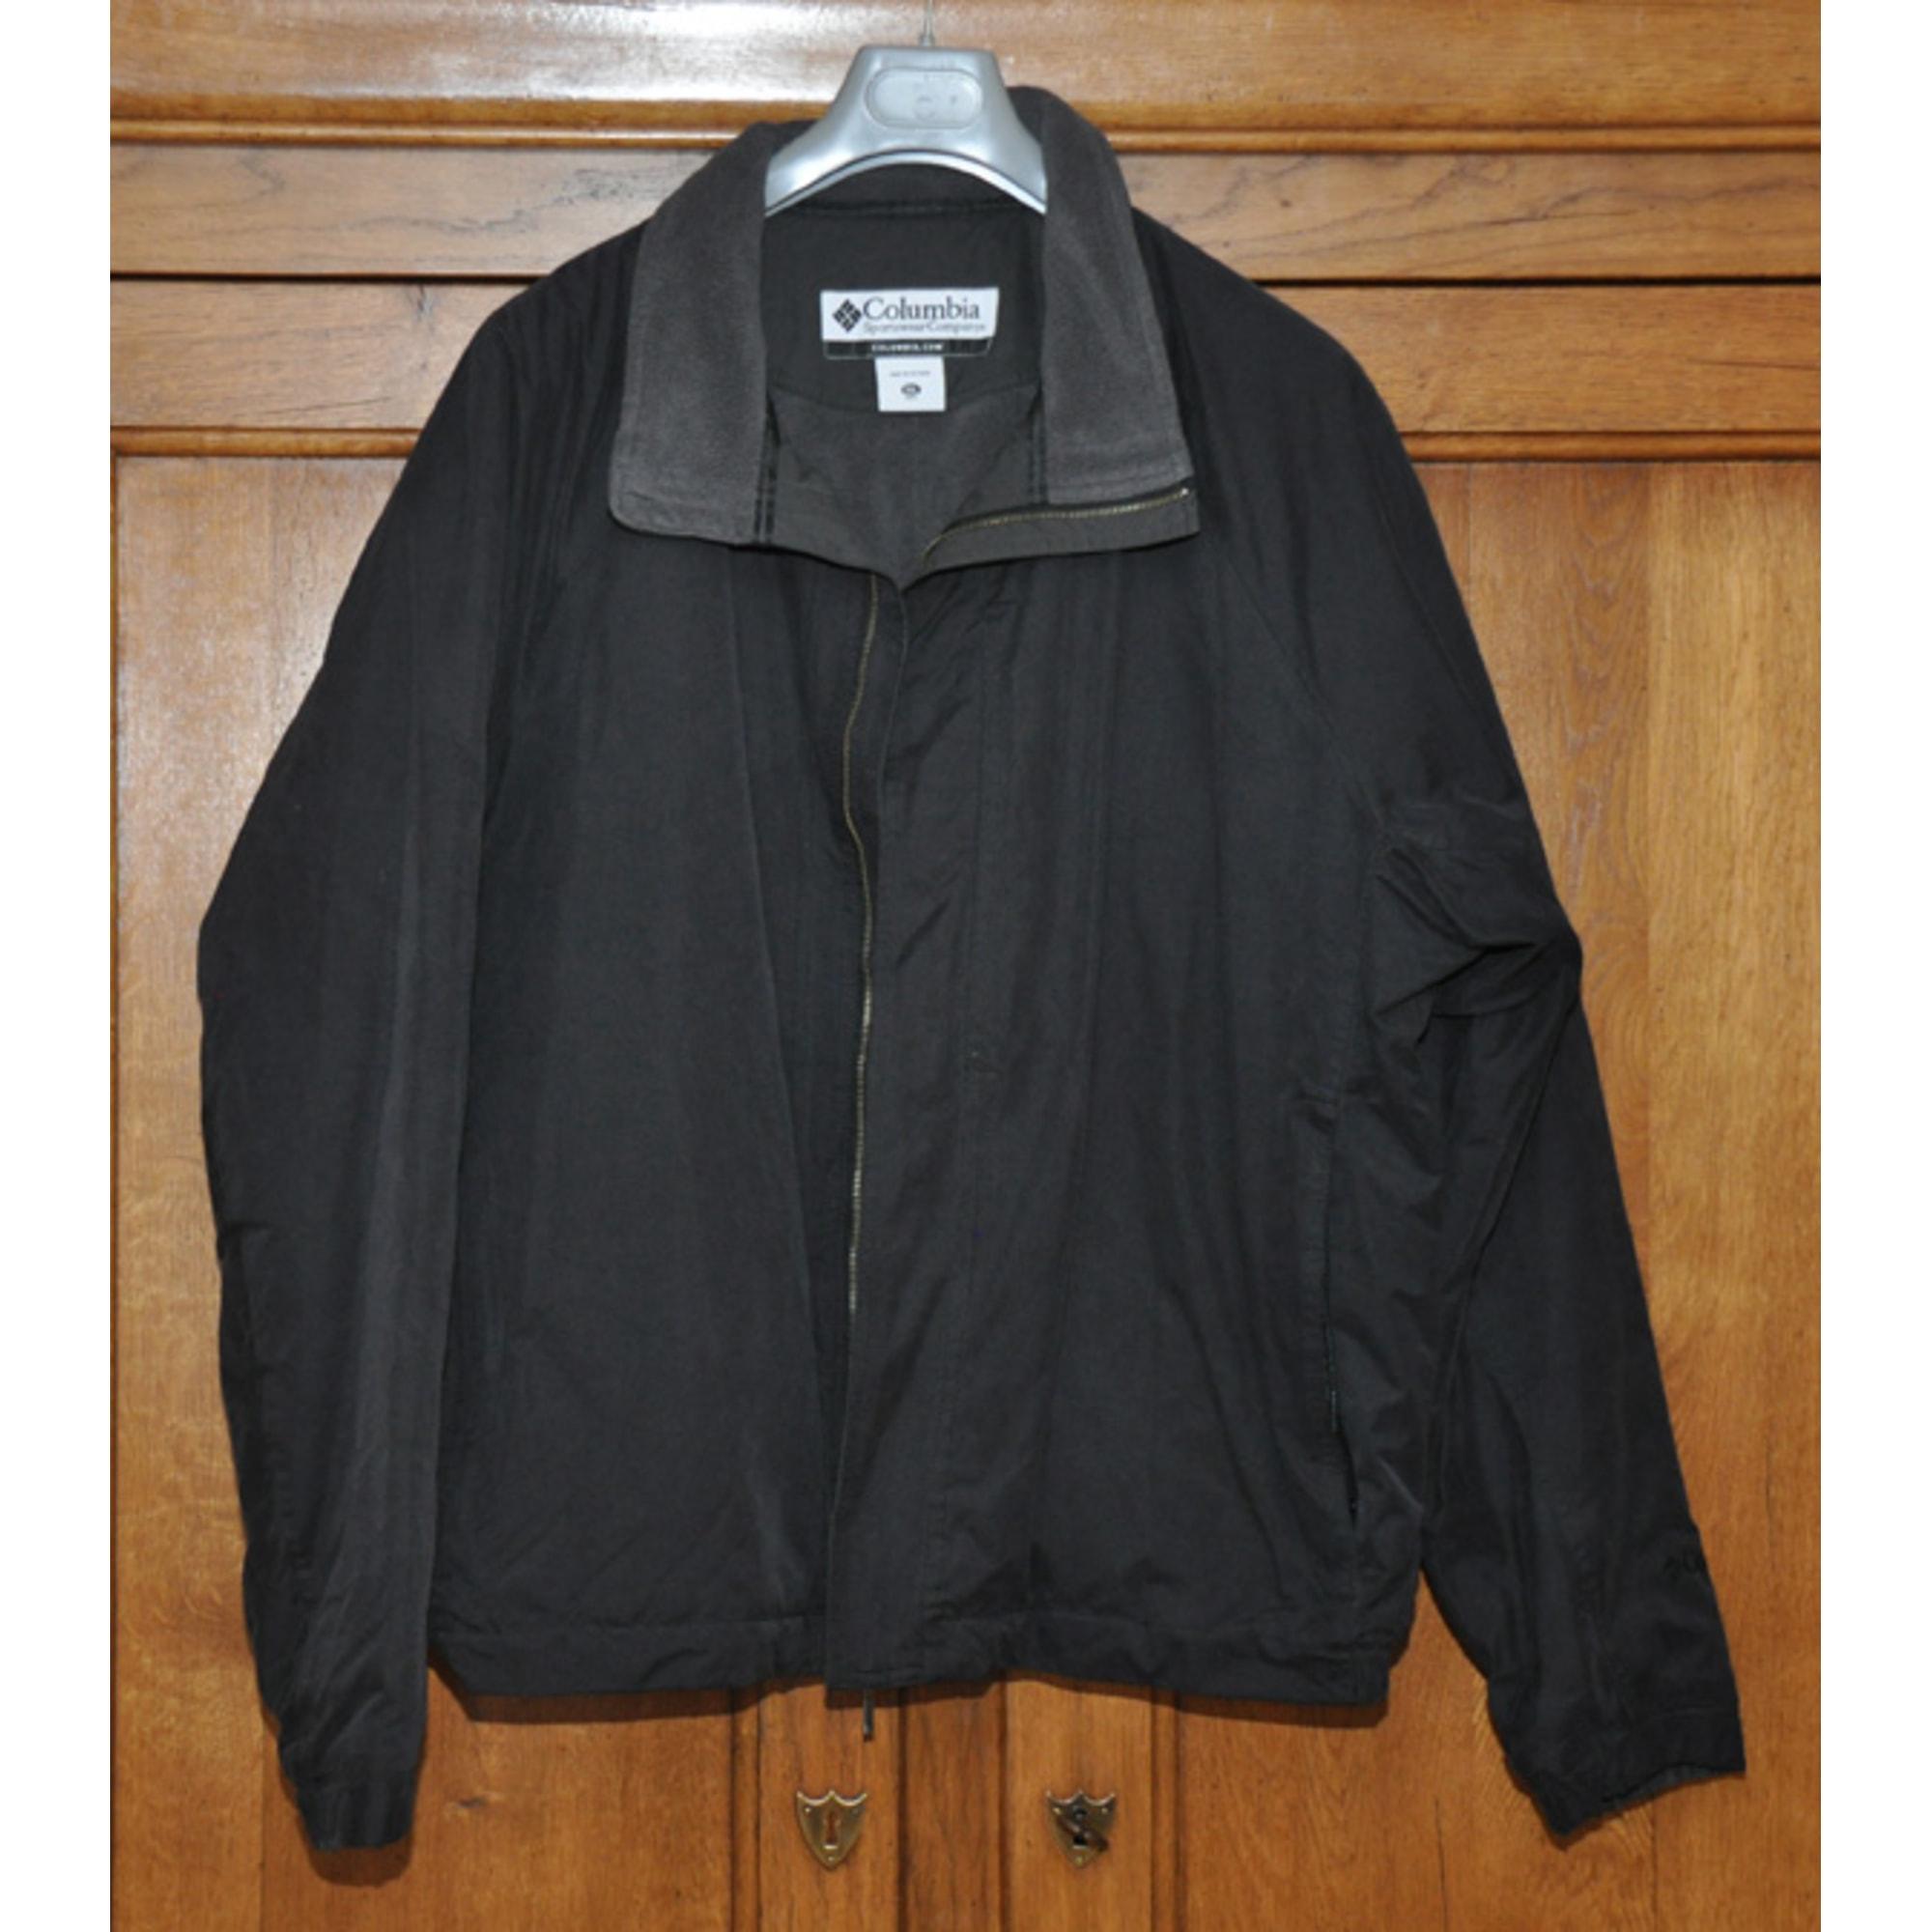 Blouson COLUMBIA Noir